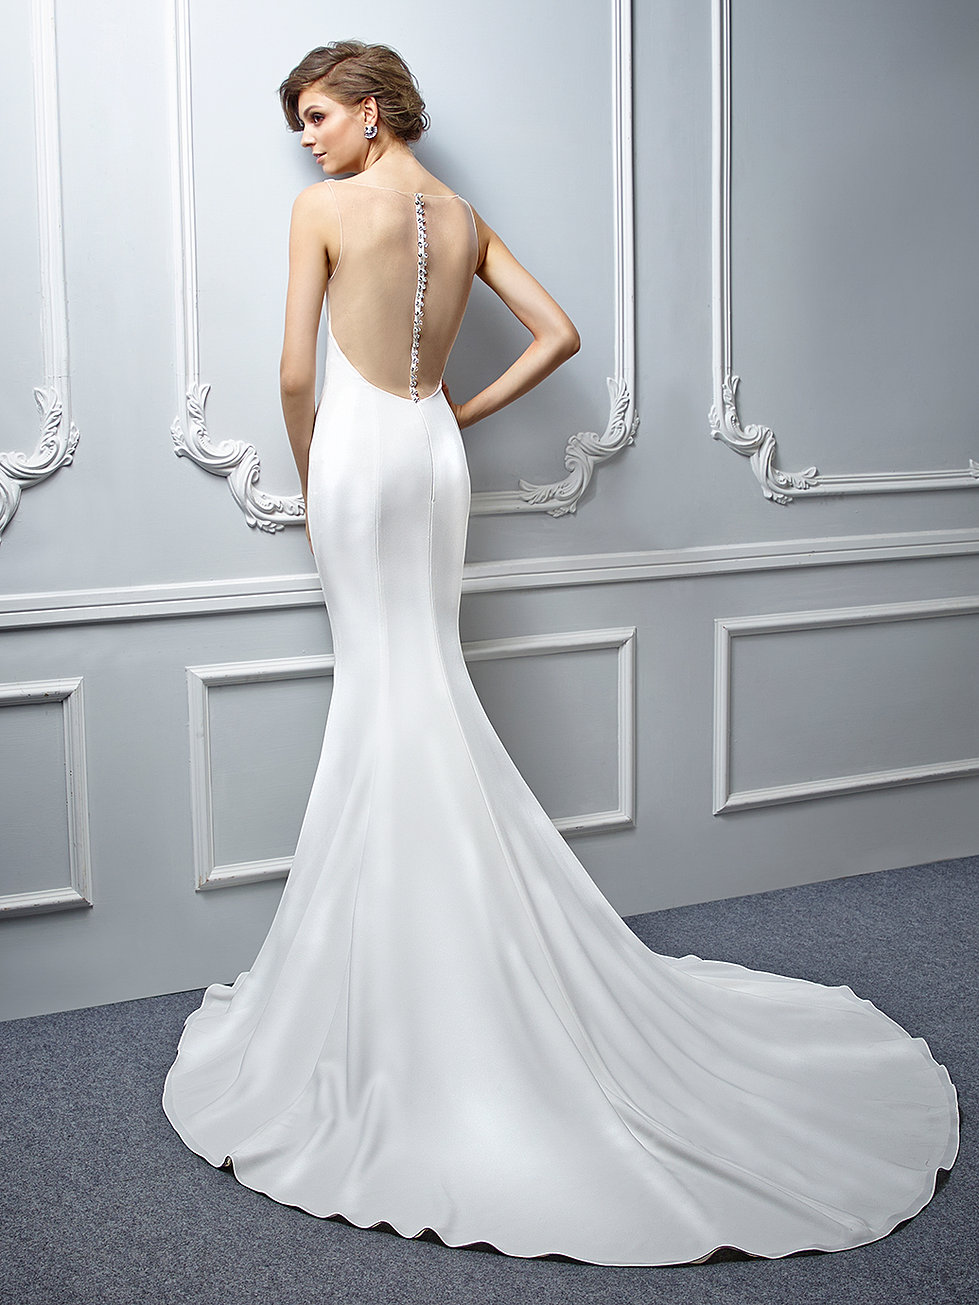 Unique Wedding Dresses Yeovil Ensign - Wedding Dress Ideas ...